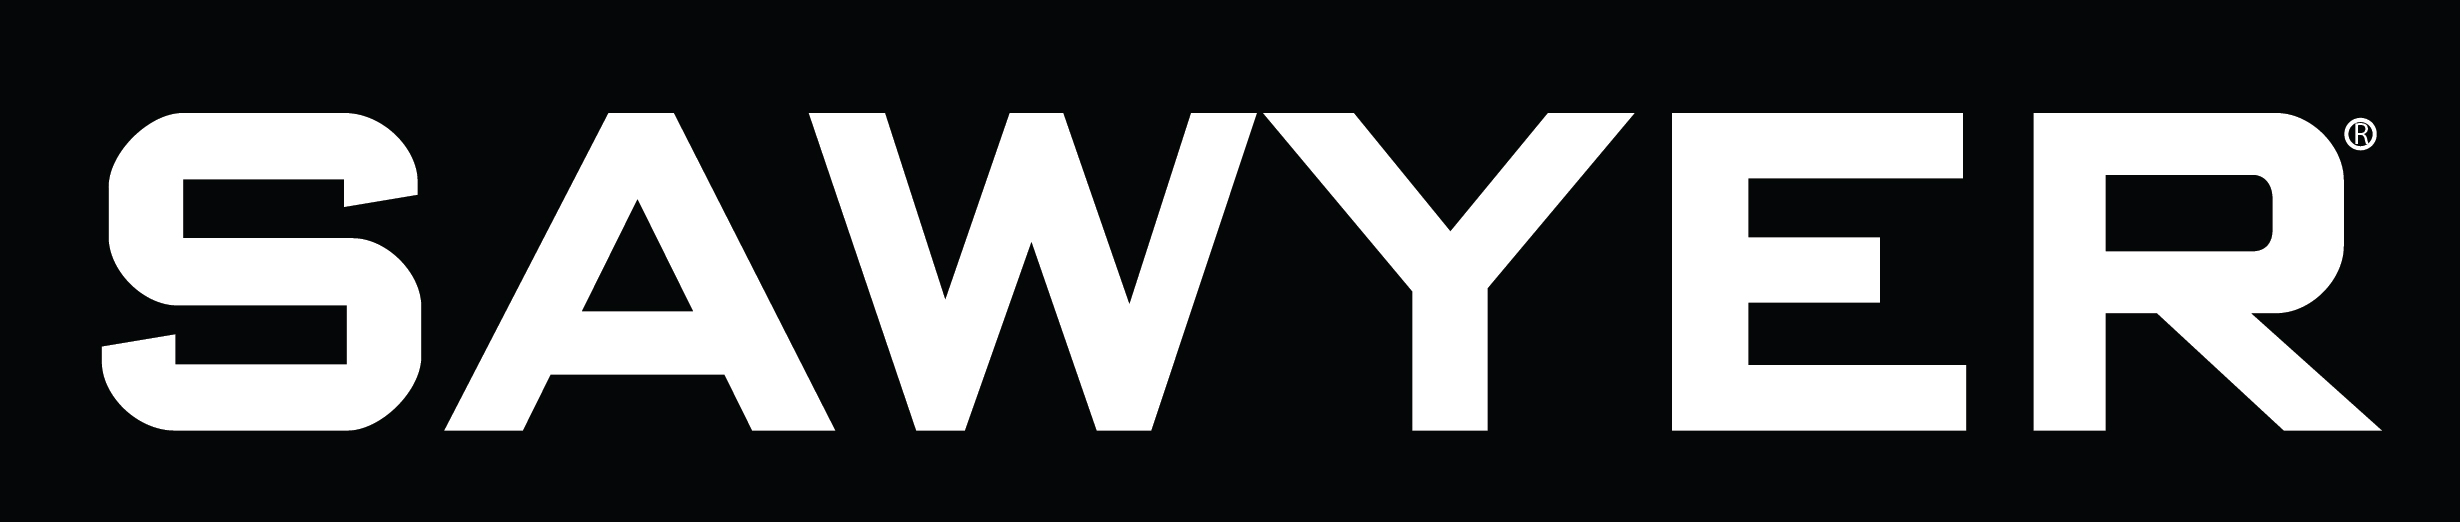 Sawyer_Logo.jpg